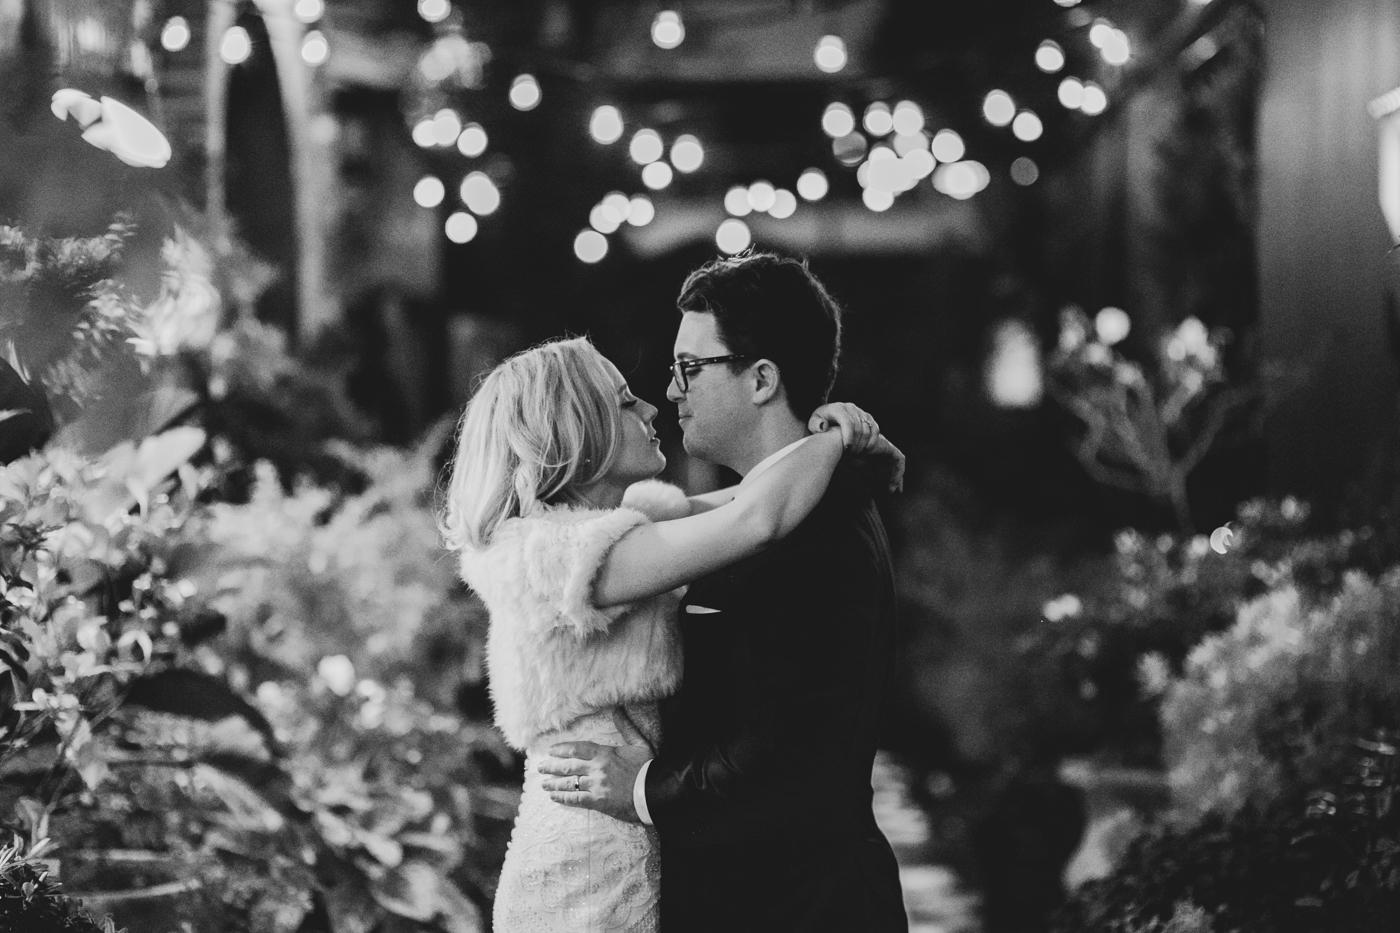 Jo & Tom Wedding - The Grounds of Alexandria - Samantha Heather Photography-325.jpg